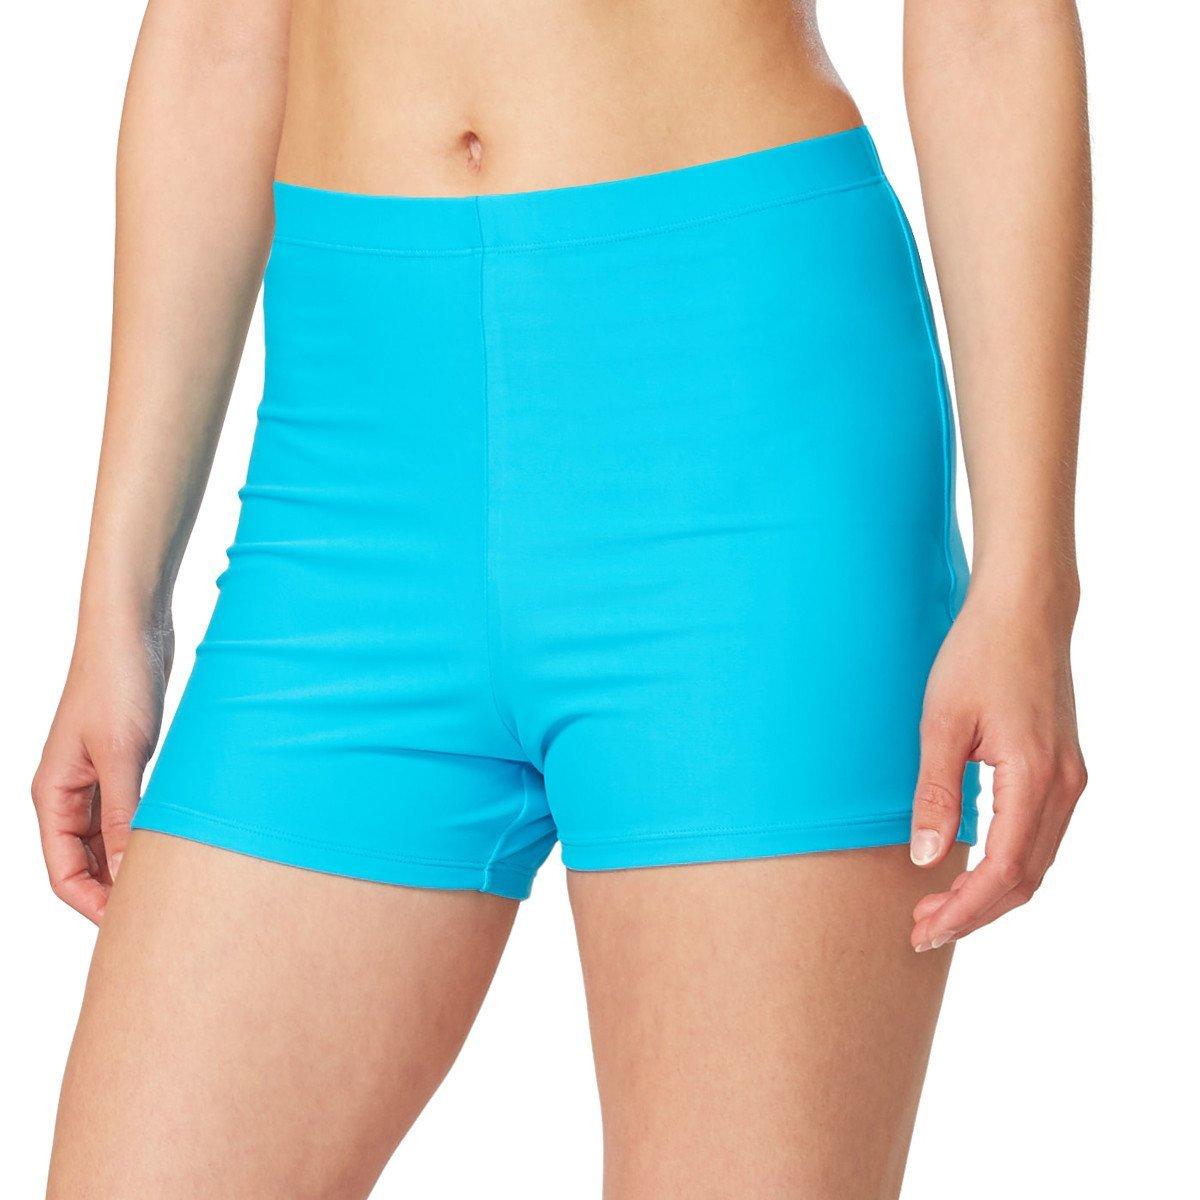 4ea6a7ed43 Baleaf Women's Basic High Waisted Boy Short Swim Bikini Tankini Bottom with  Liner at Amazon Women's Clothing store: